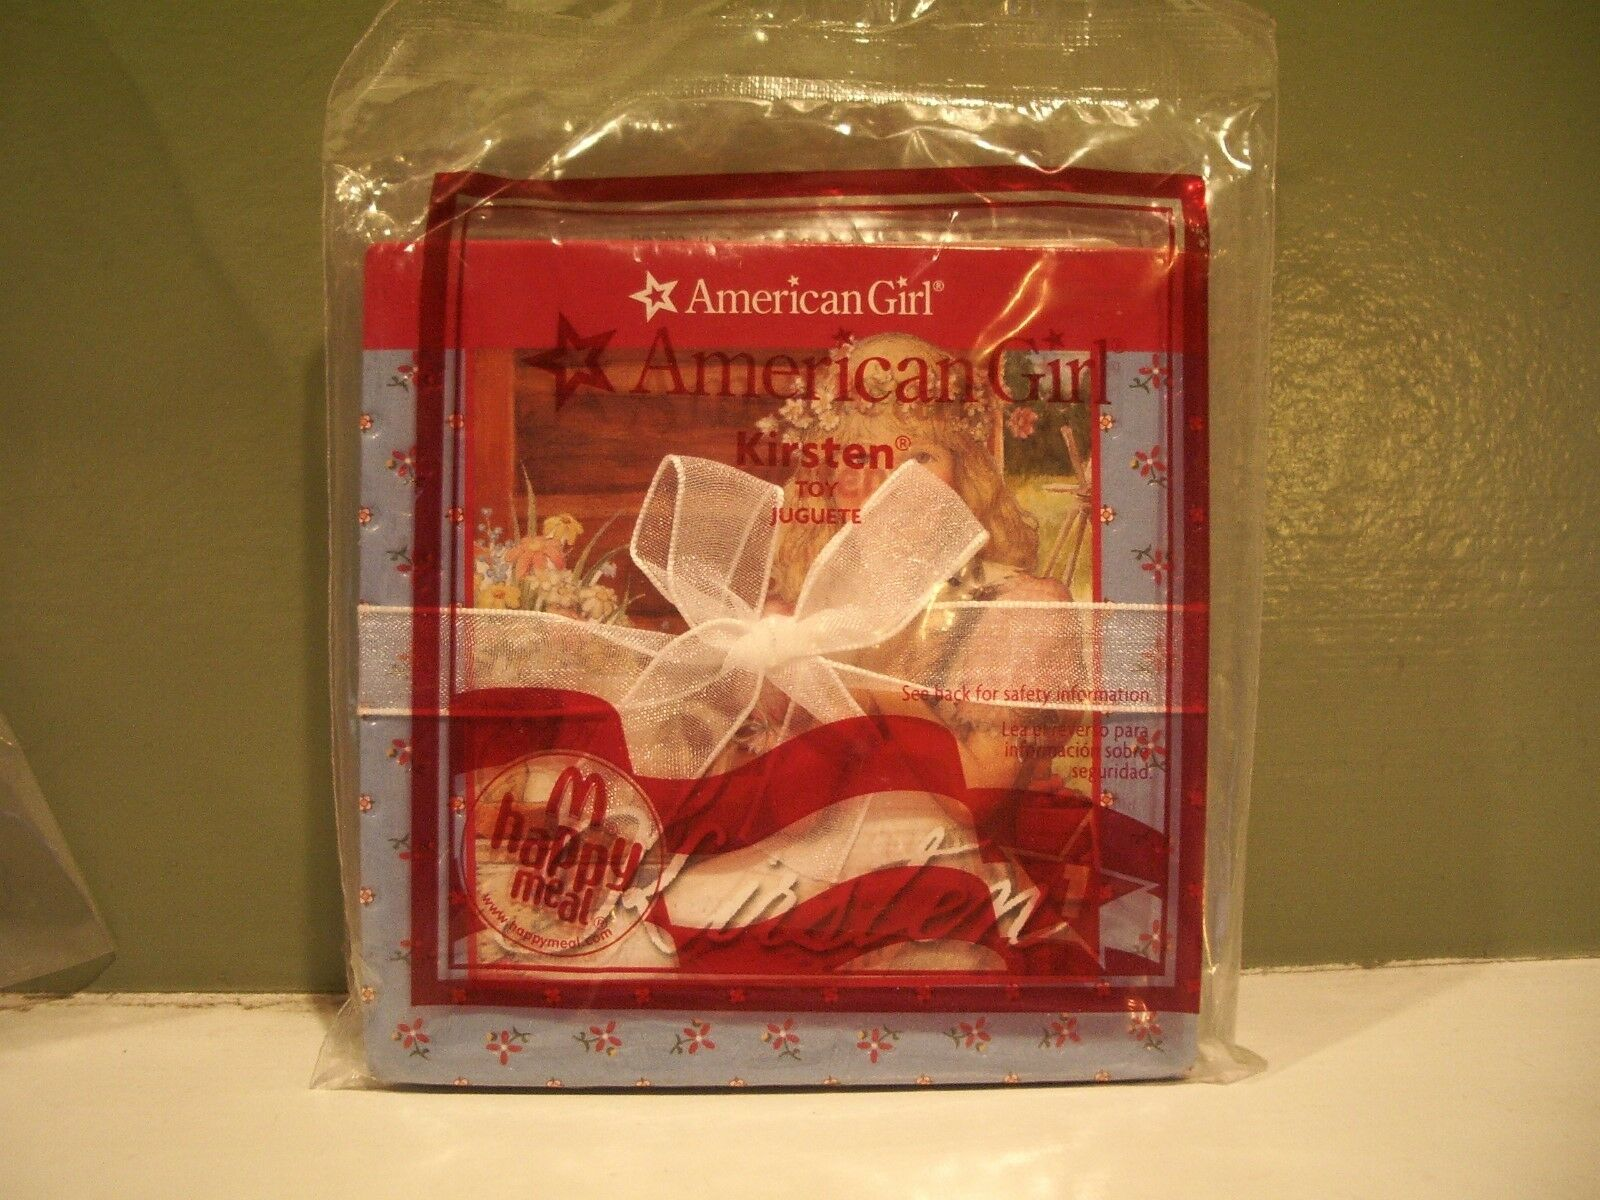 American Girl McDonald/'s happy meal book 2009 #1 Kirsten new in package